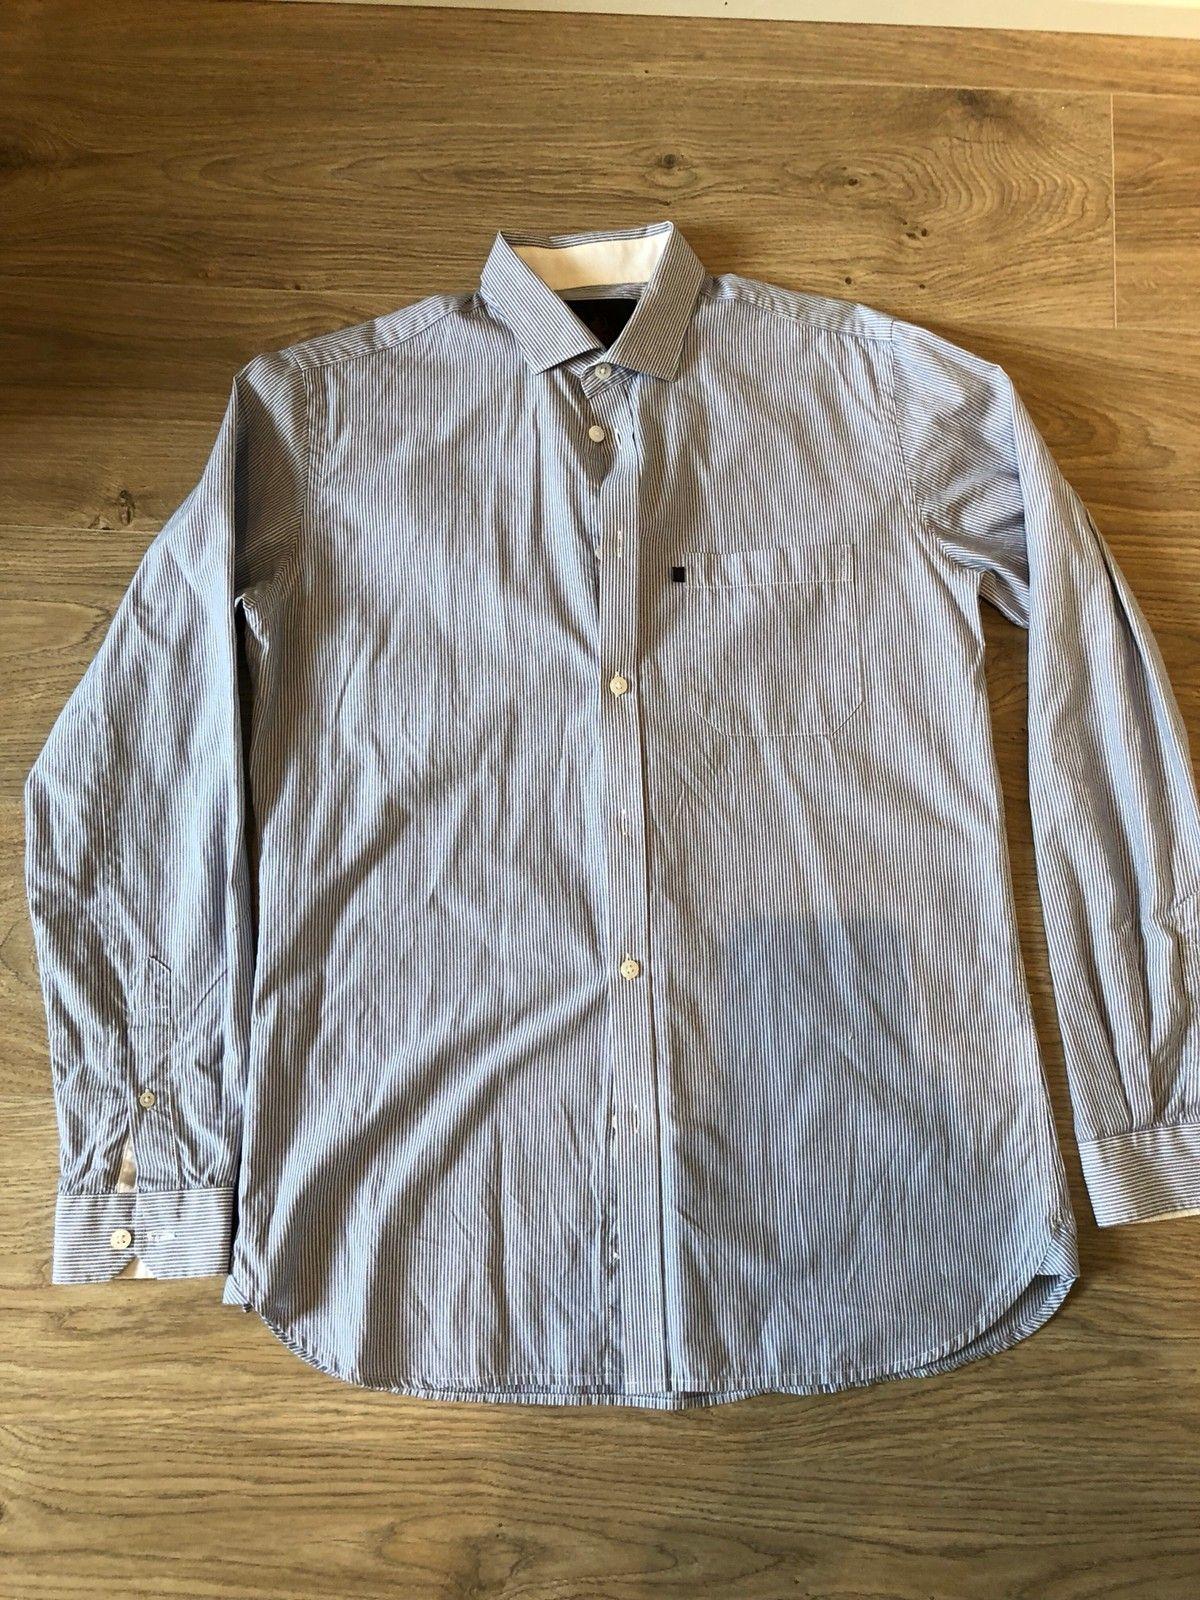 Skjorte, Made by Monkeys | FINN.no